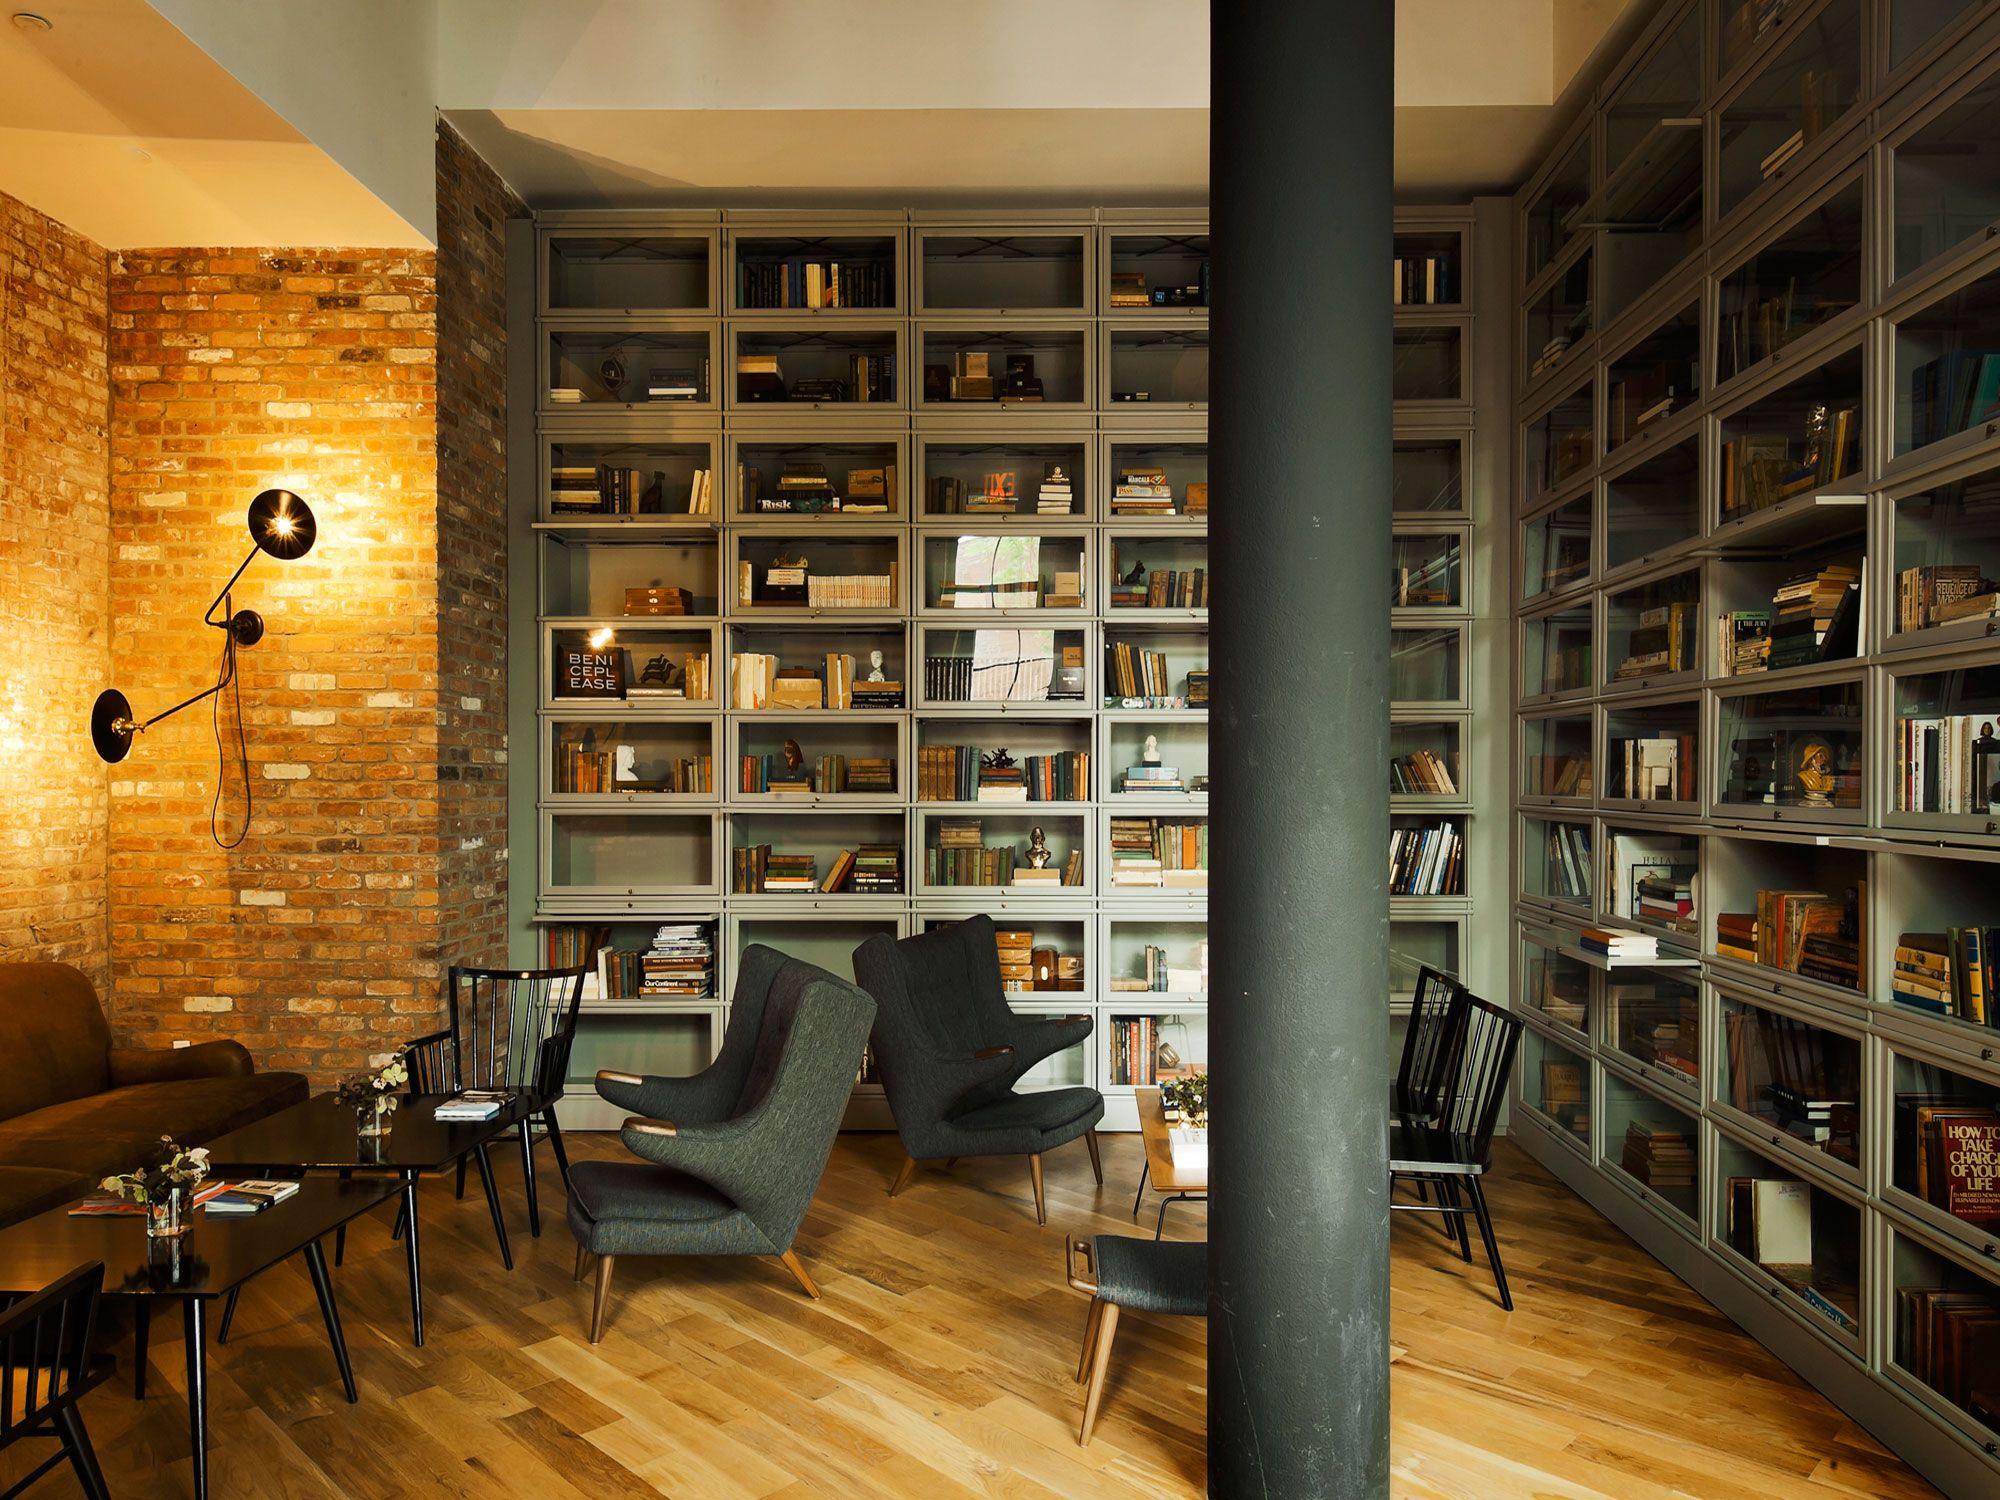 Interior Design By Workstead Bookshelf Ideasbookshelveslight Fixturestudy